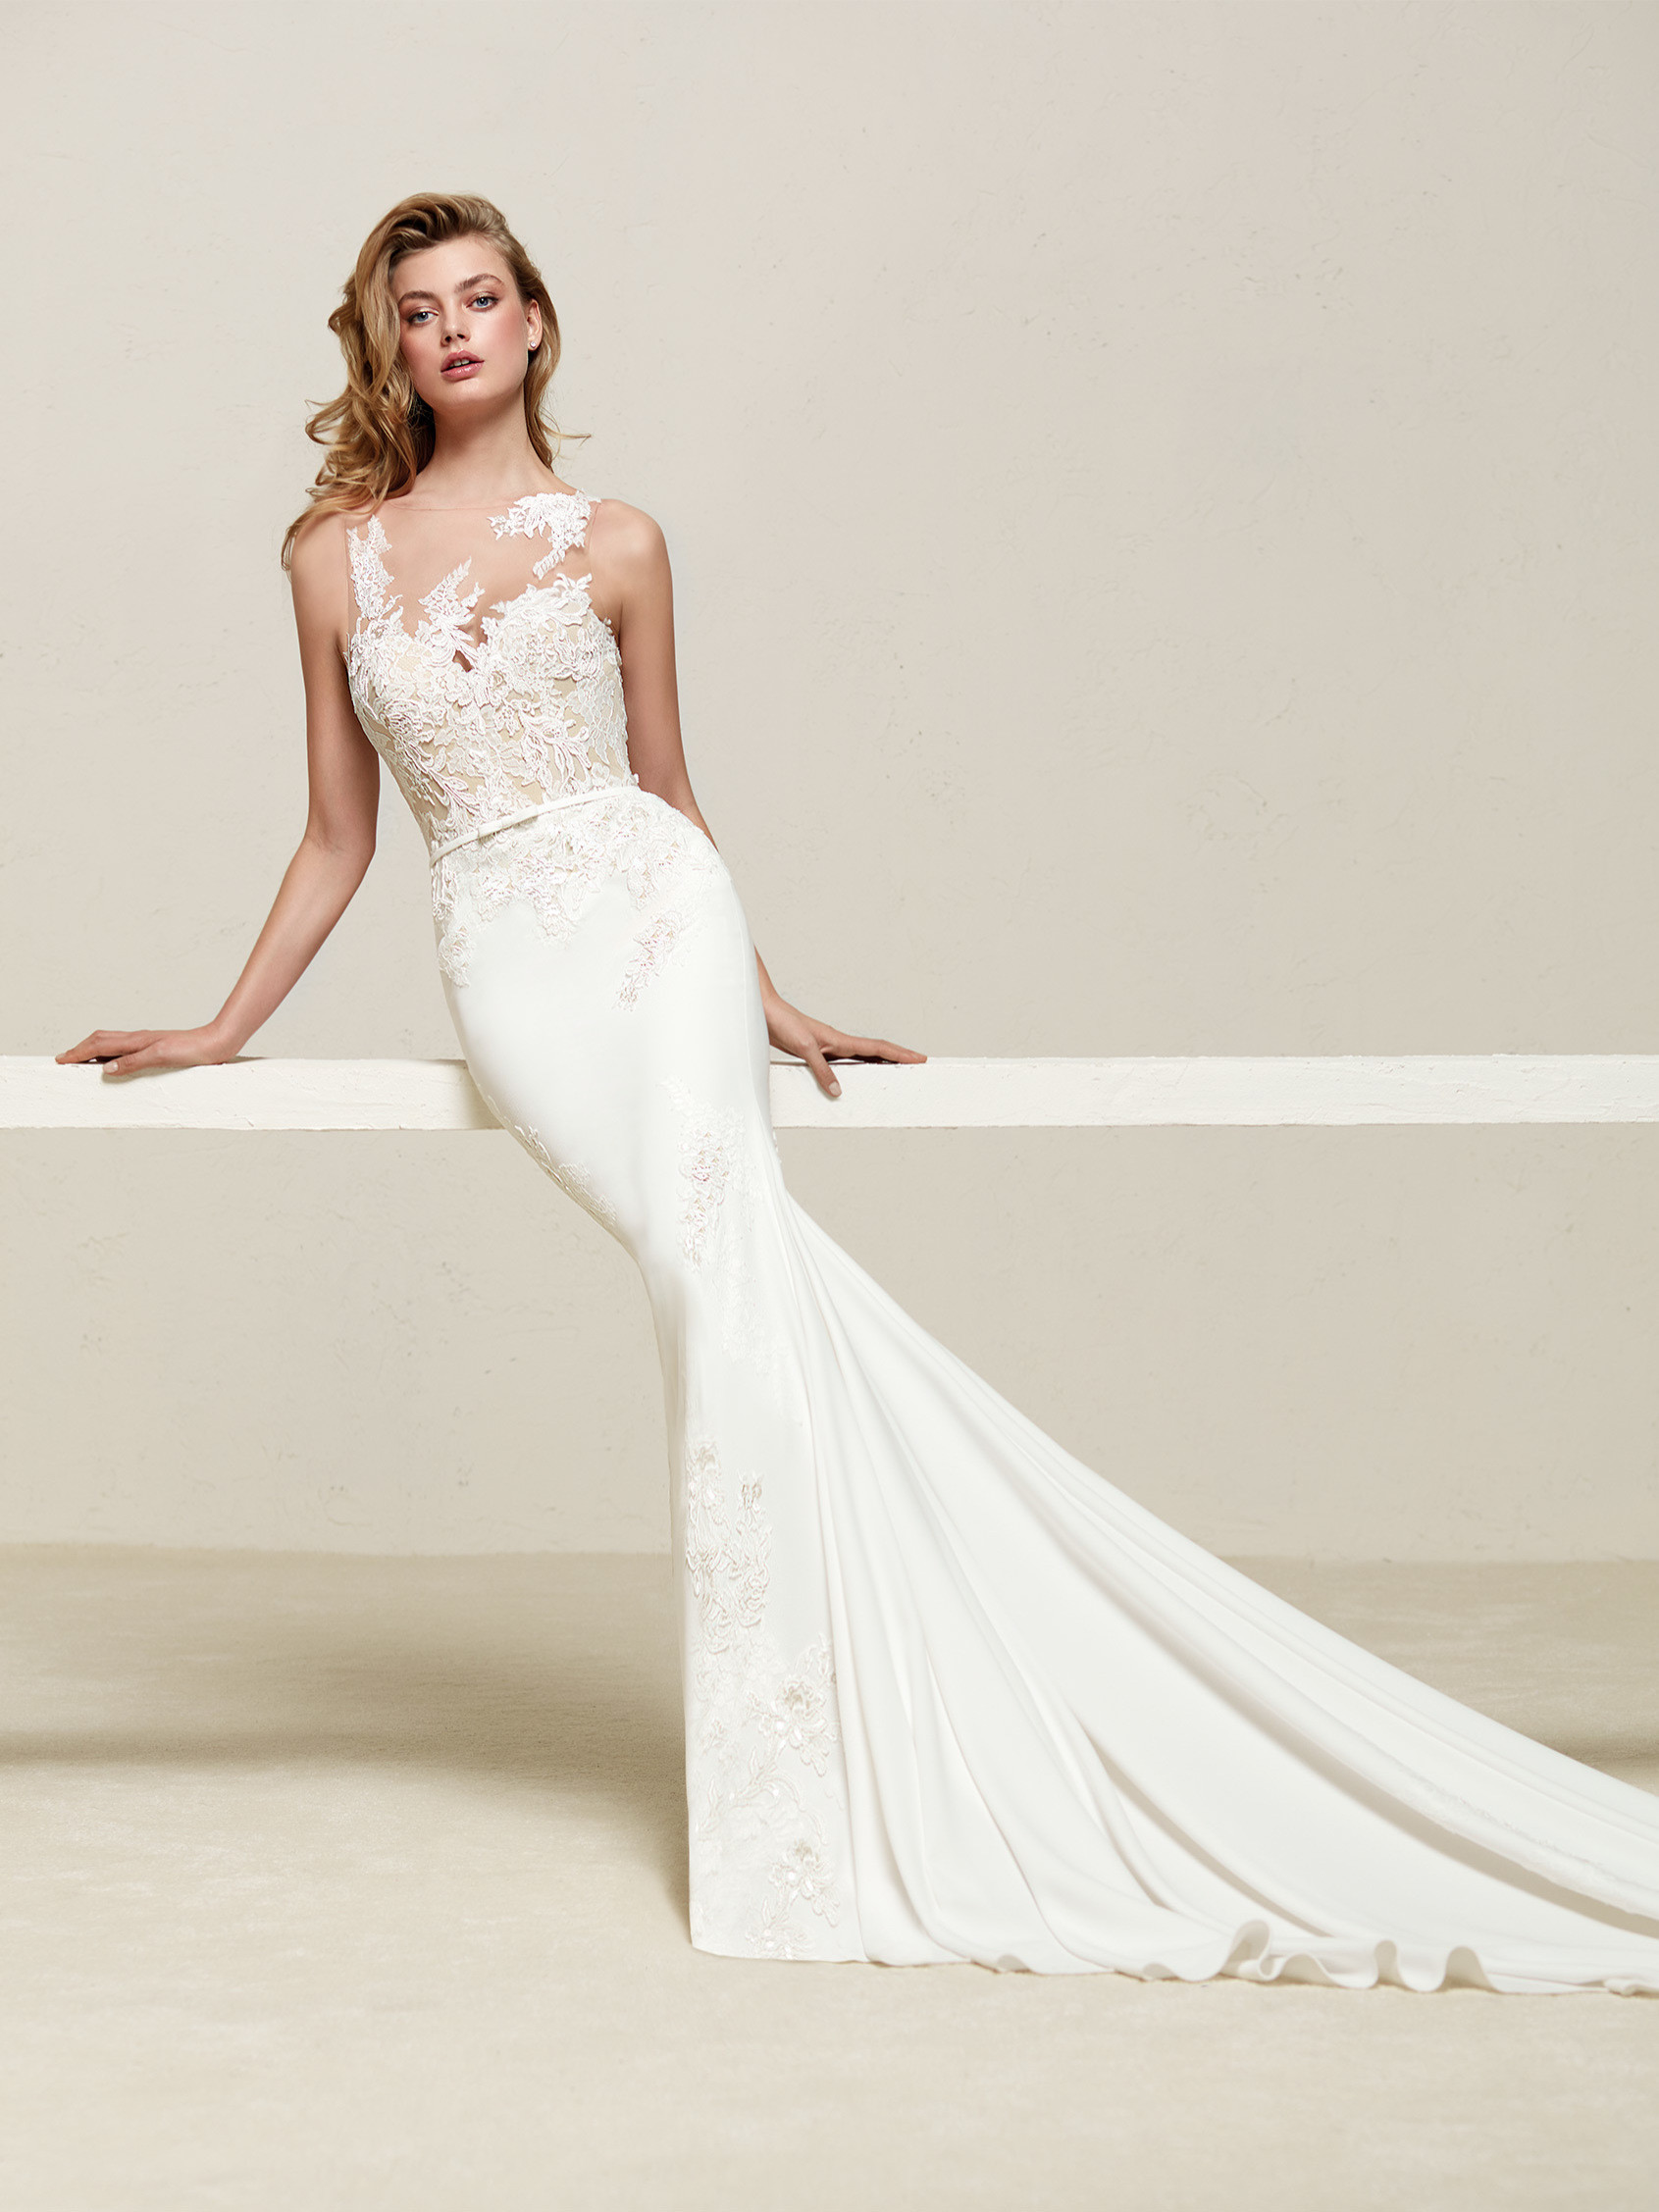 National Bridal Sale Event Lilla's Bridal